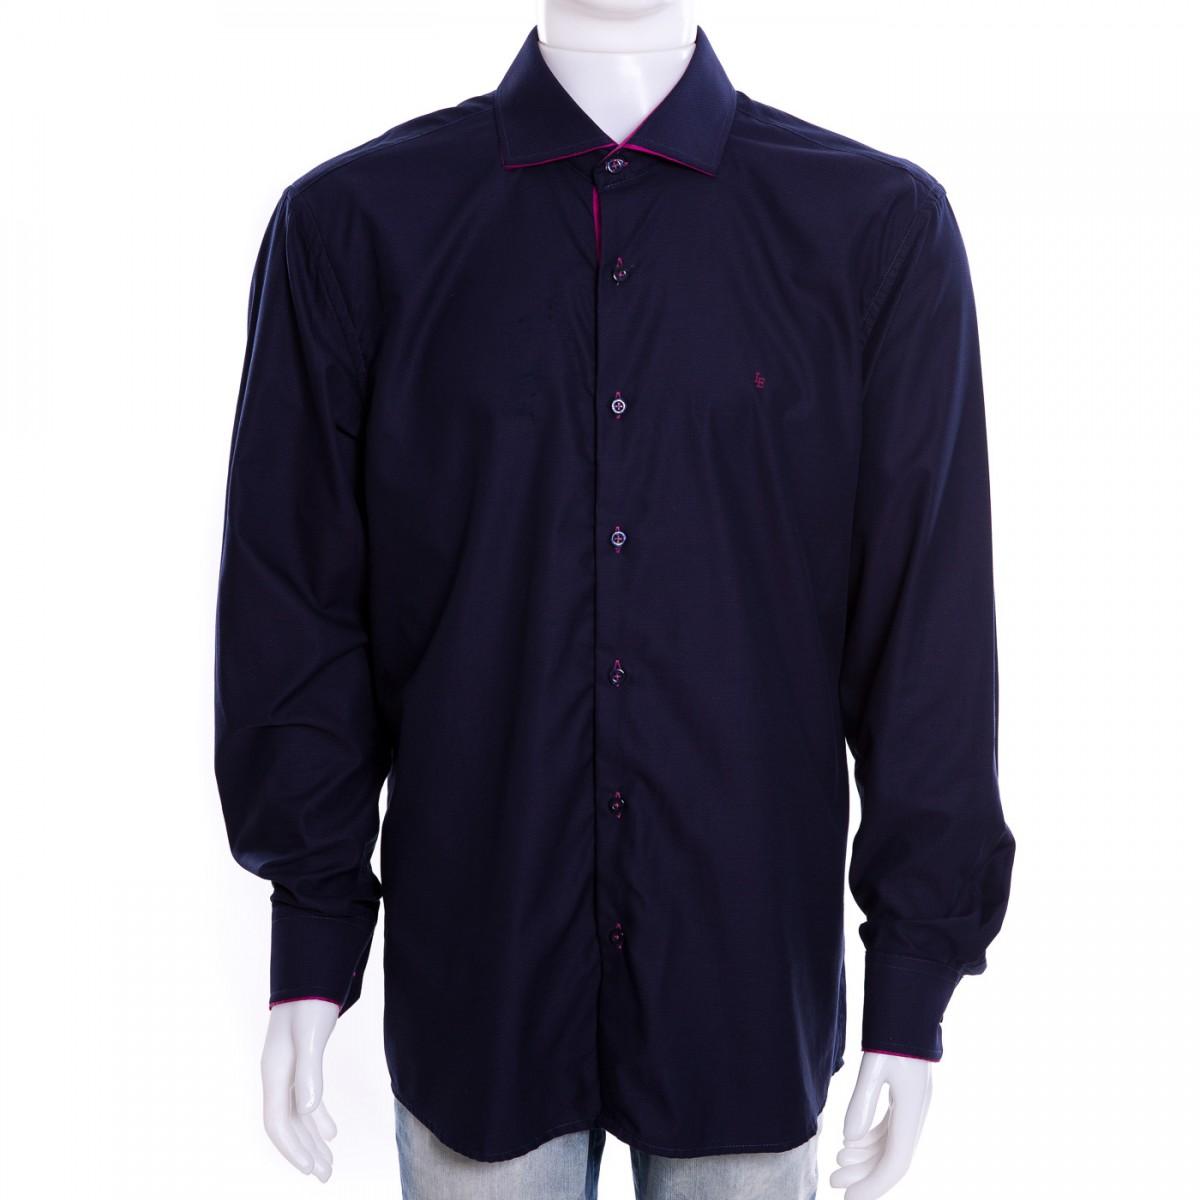 b2ebae17b Bizz Store - Camisa Social Masculina Luiz Eugenio Slim Confort